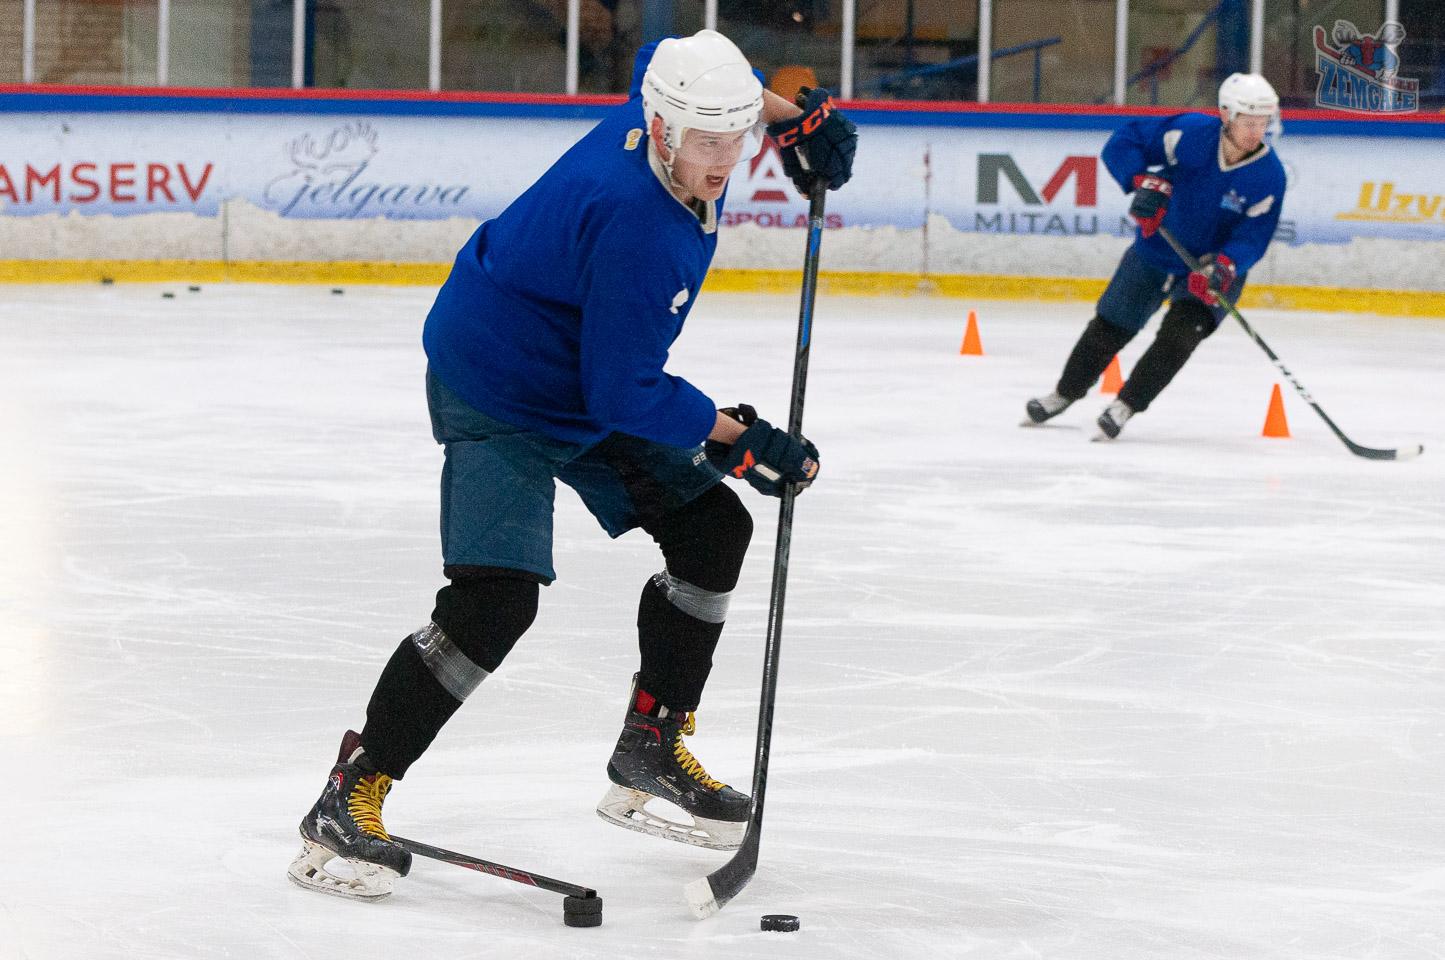 Hokejisti veic treniņa uzdevumu